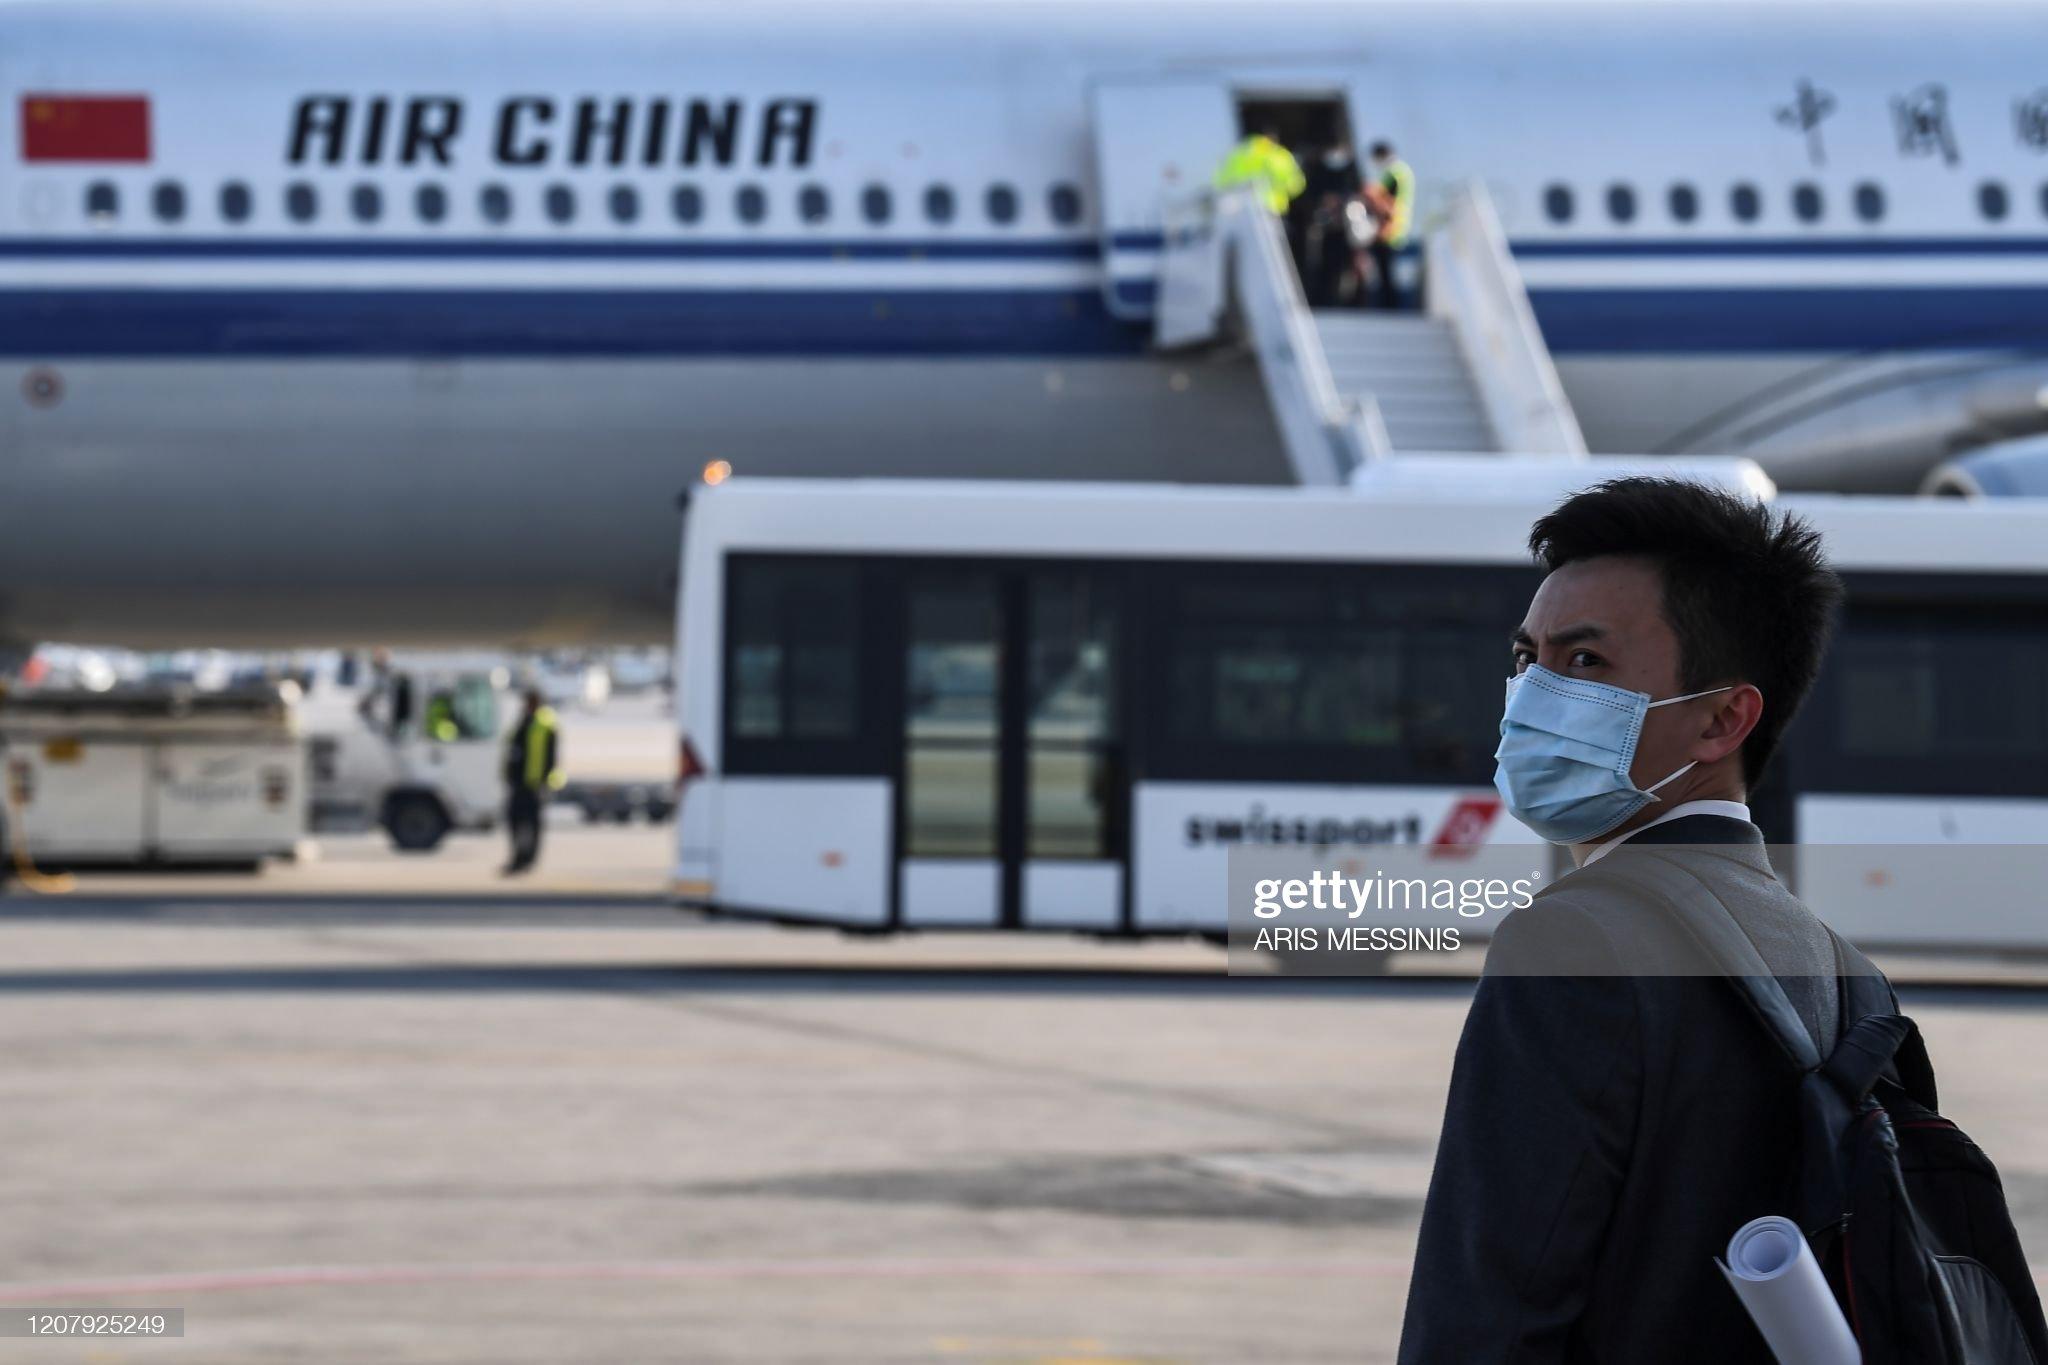 GREECE-CHINA-HEALTH-VIRUS : ニュース写真